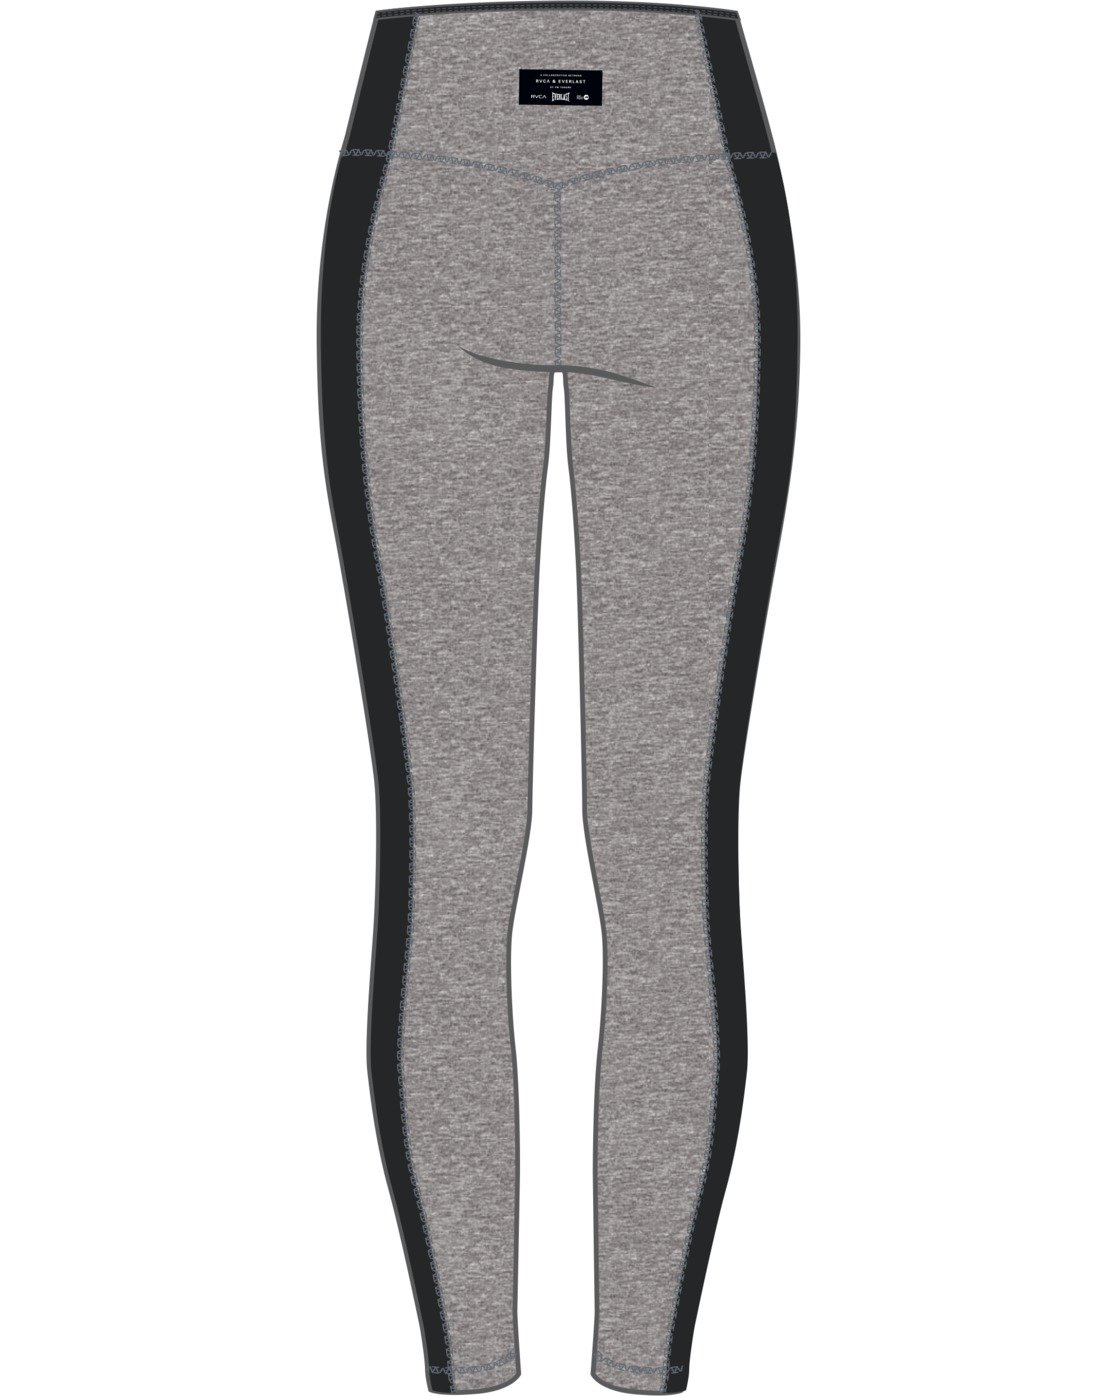 8 Everlast x RVCA Lace Up - High Waist Sports Leggings for Women Grey W4PTWDRVP1 RVCA